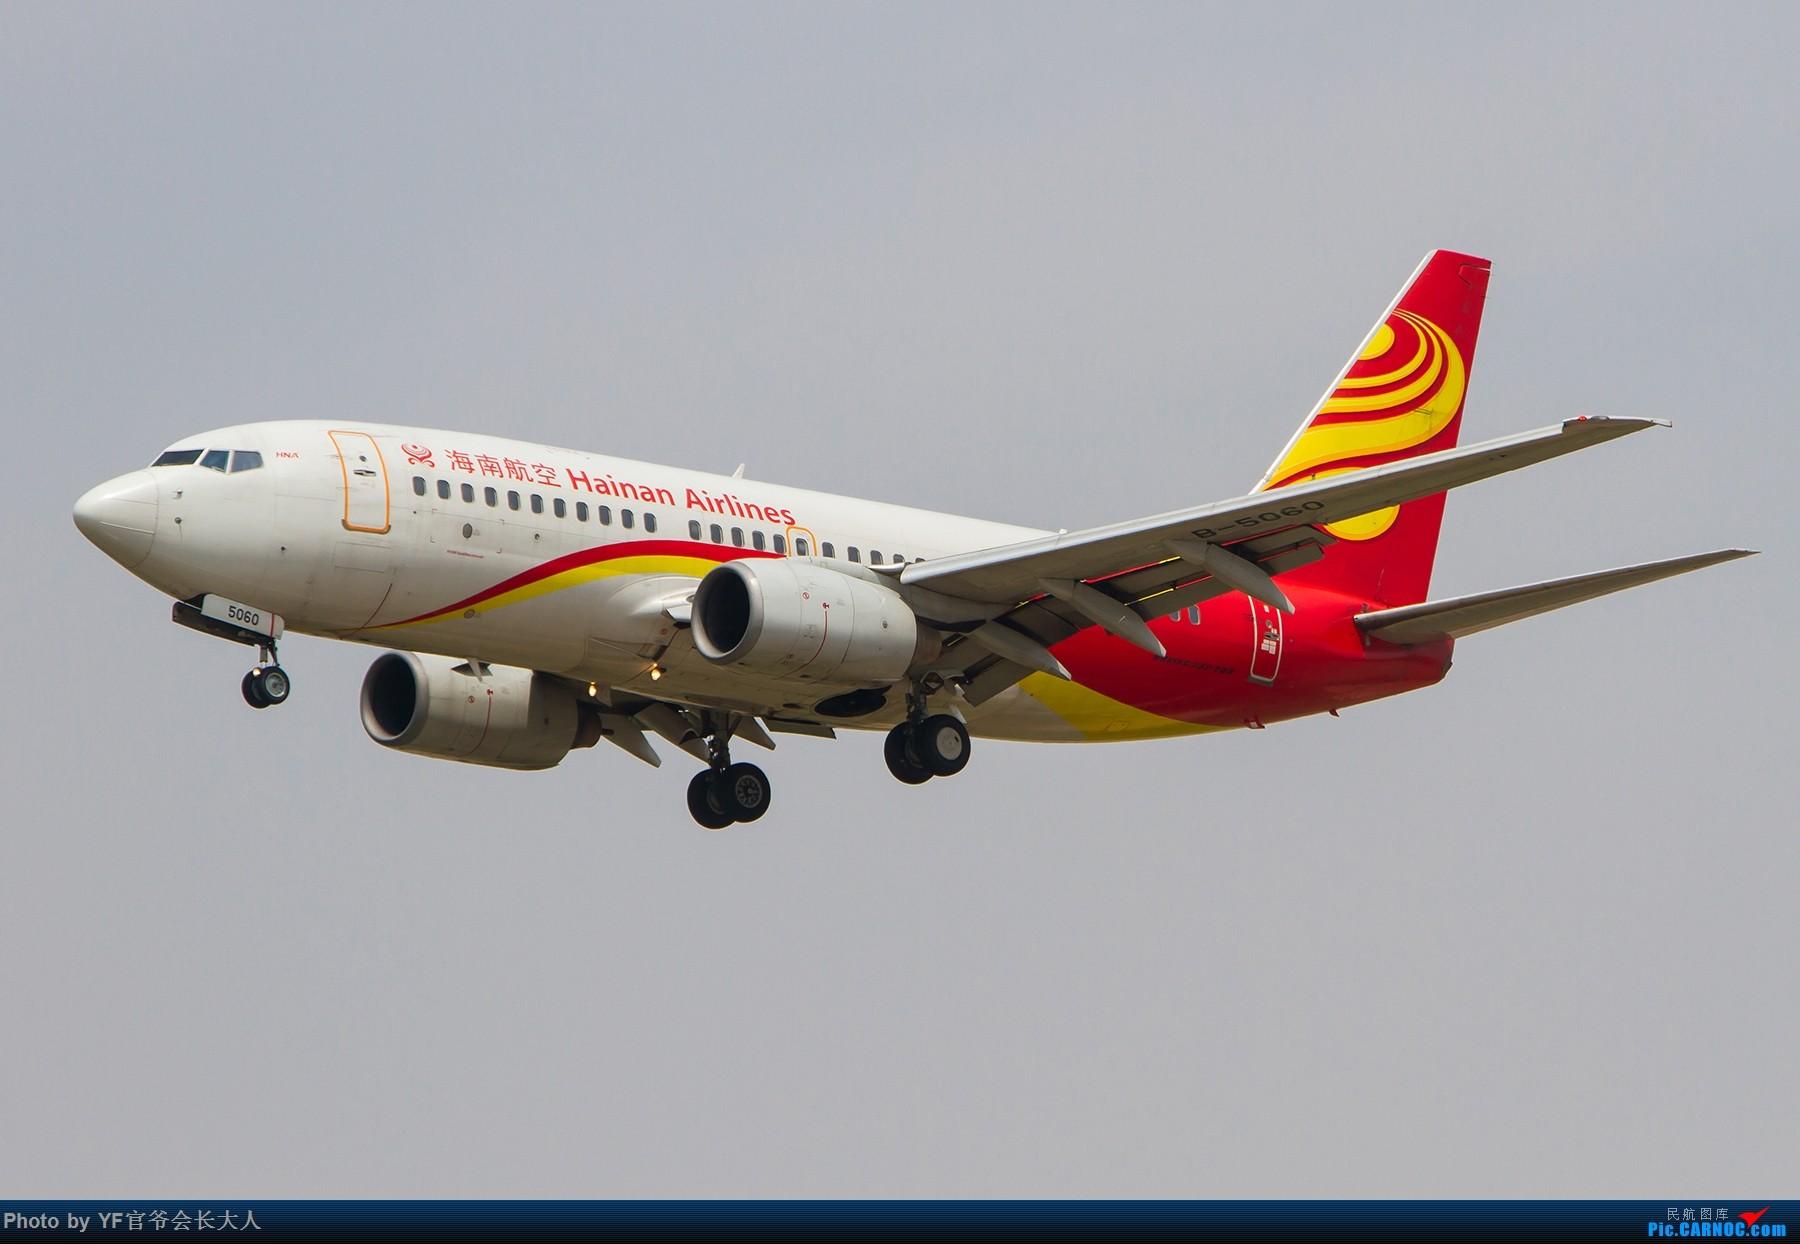 Re:[原创]【ZYTX】轻易不拍机,拍就要拍个过瘾!(新开的酷鸟,亚洲大西洋,顺带碰上朝韩两国的好货) BOEING 737-700 B-5060 中国沈阳桃仙国际机场